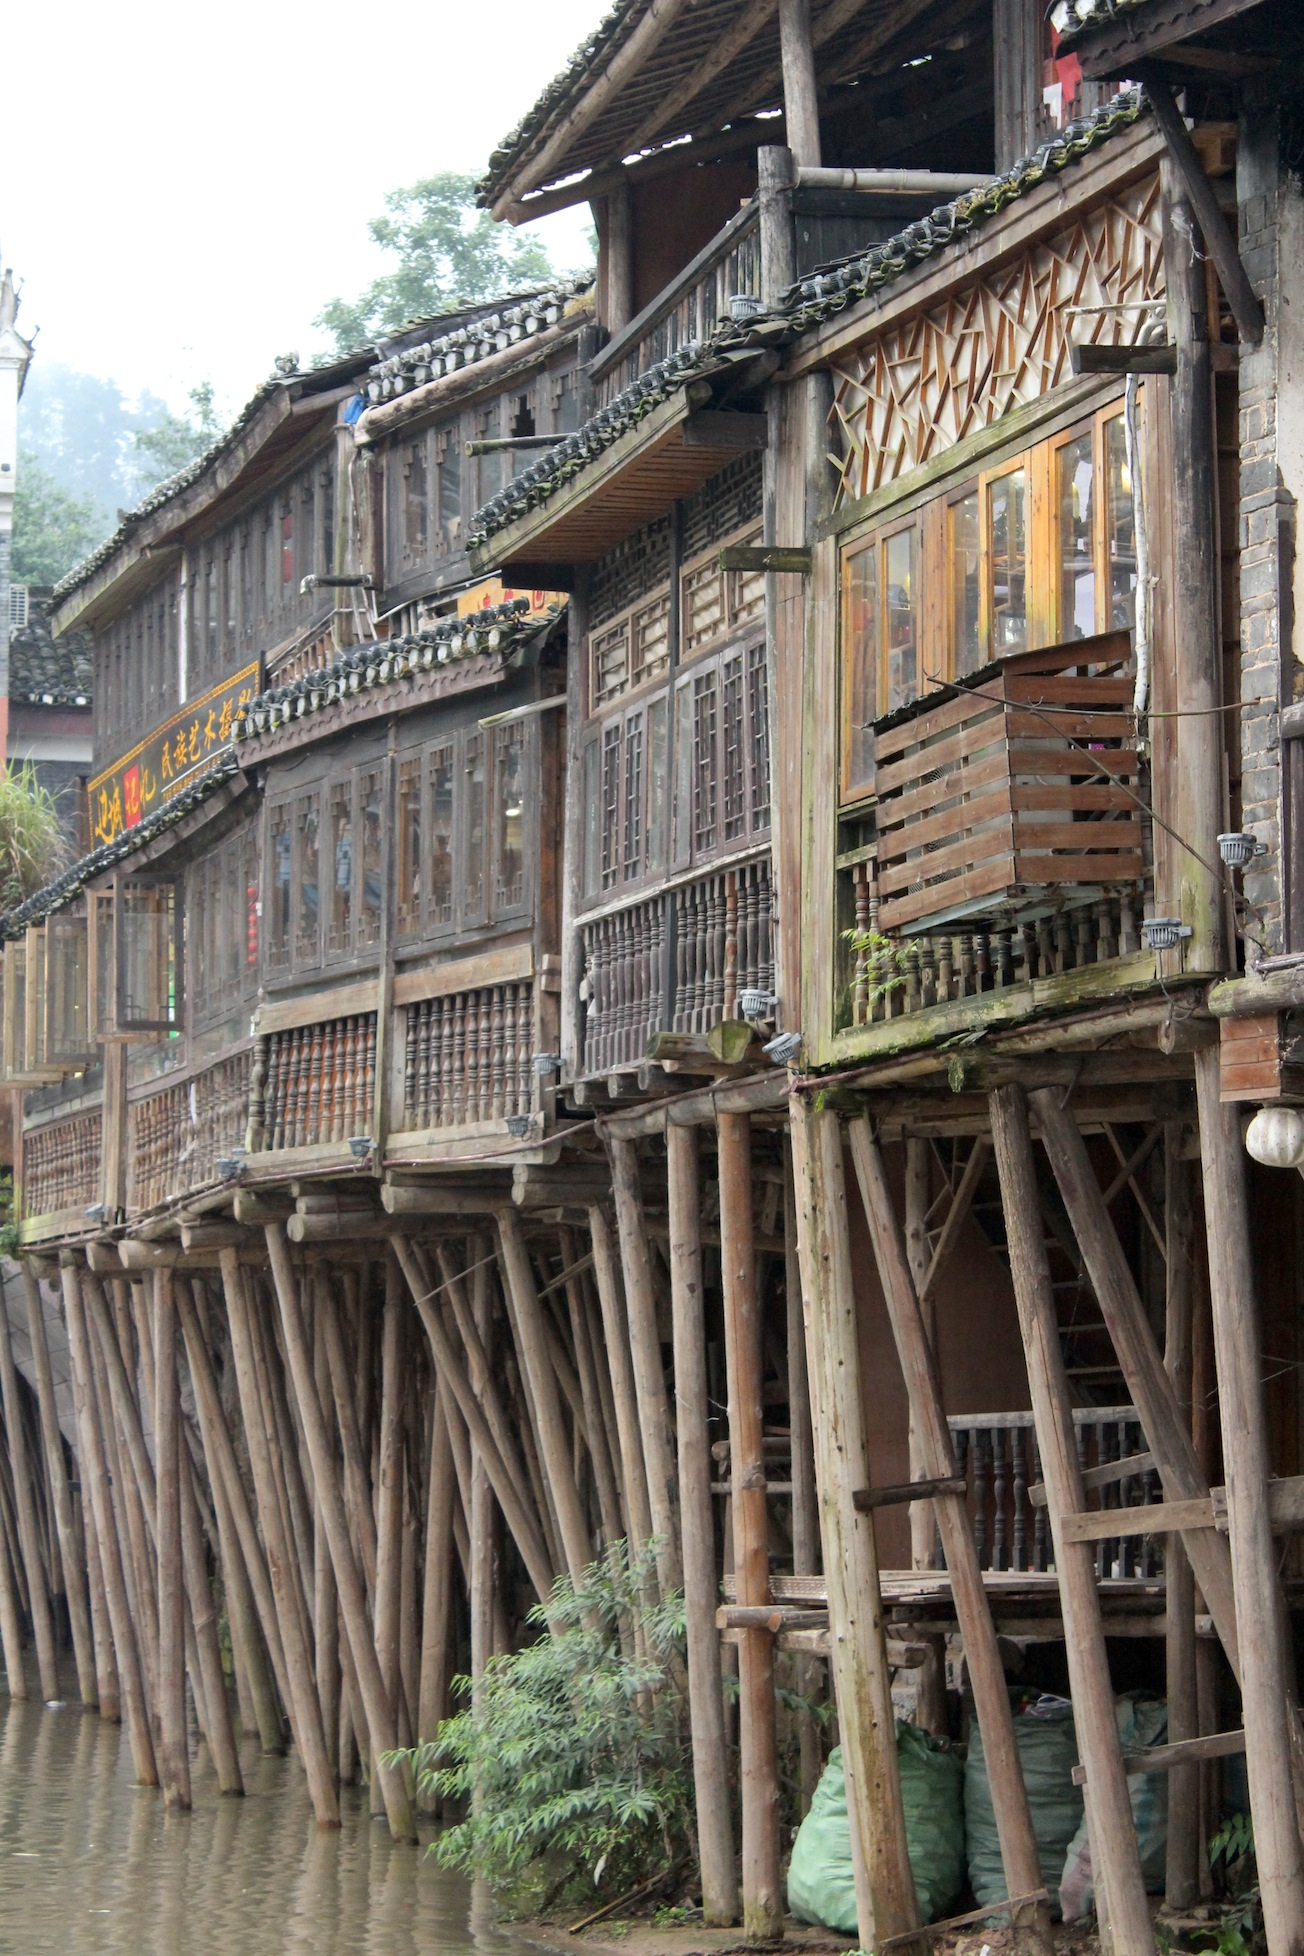 Fenghuang 15 houses on stilts